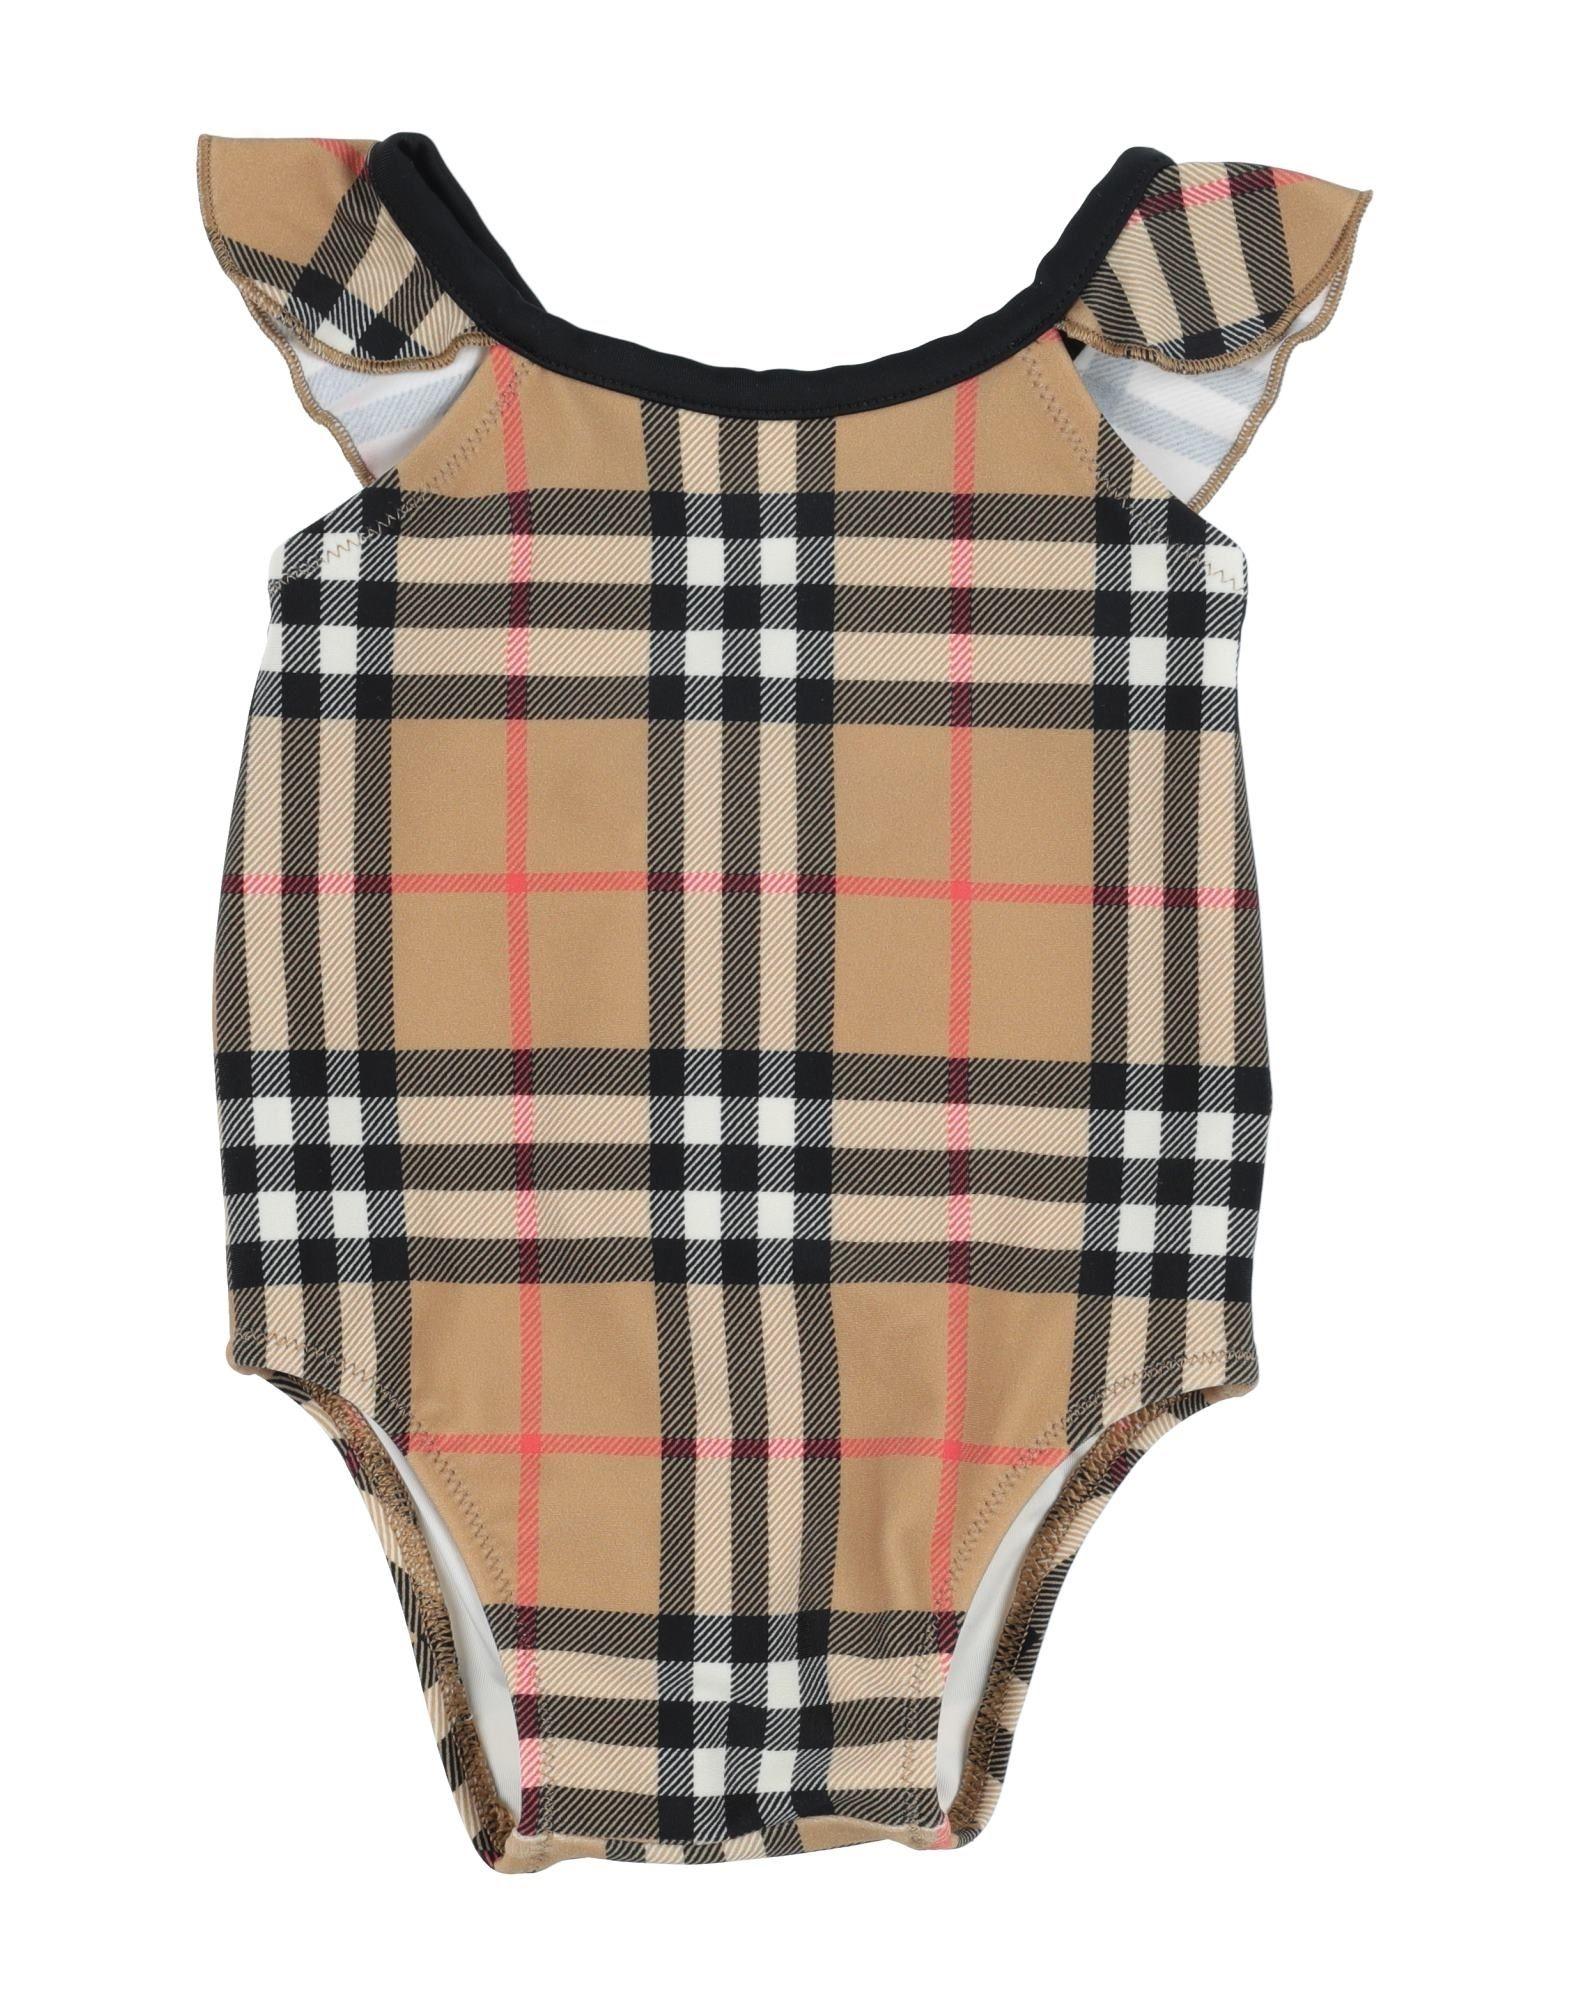 454f0fec4bb Ολόσωμα Μαγιό 0-24 μηνών Kορίτσι - Παιδικά ρούχα στο YOOX